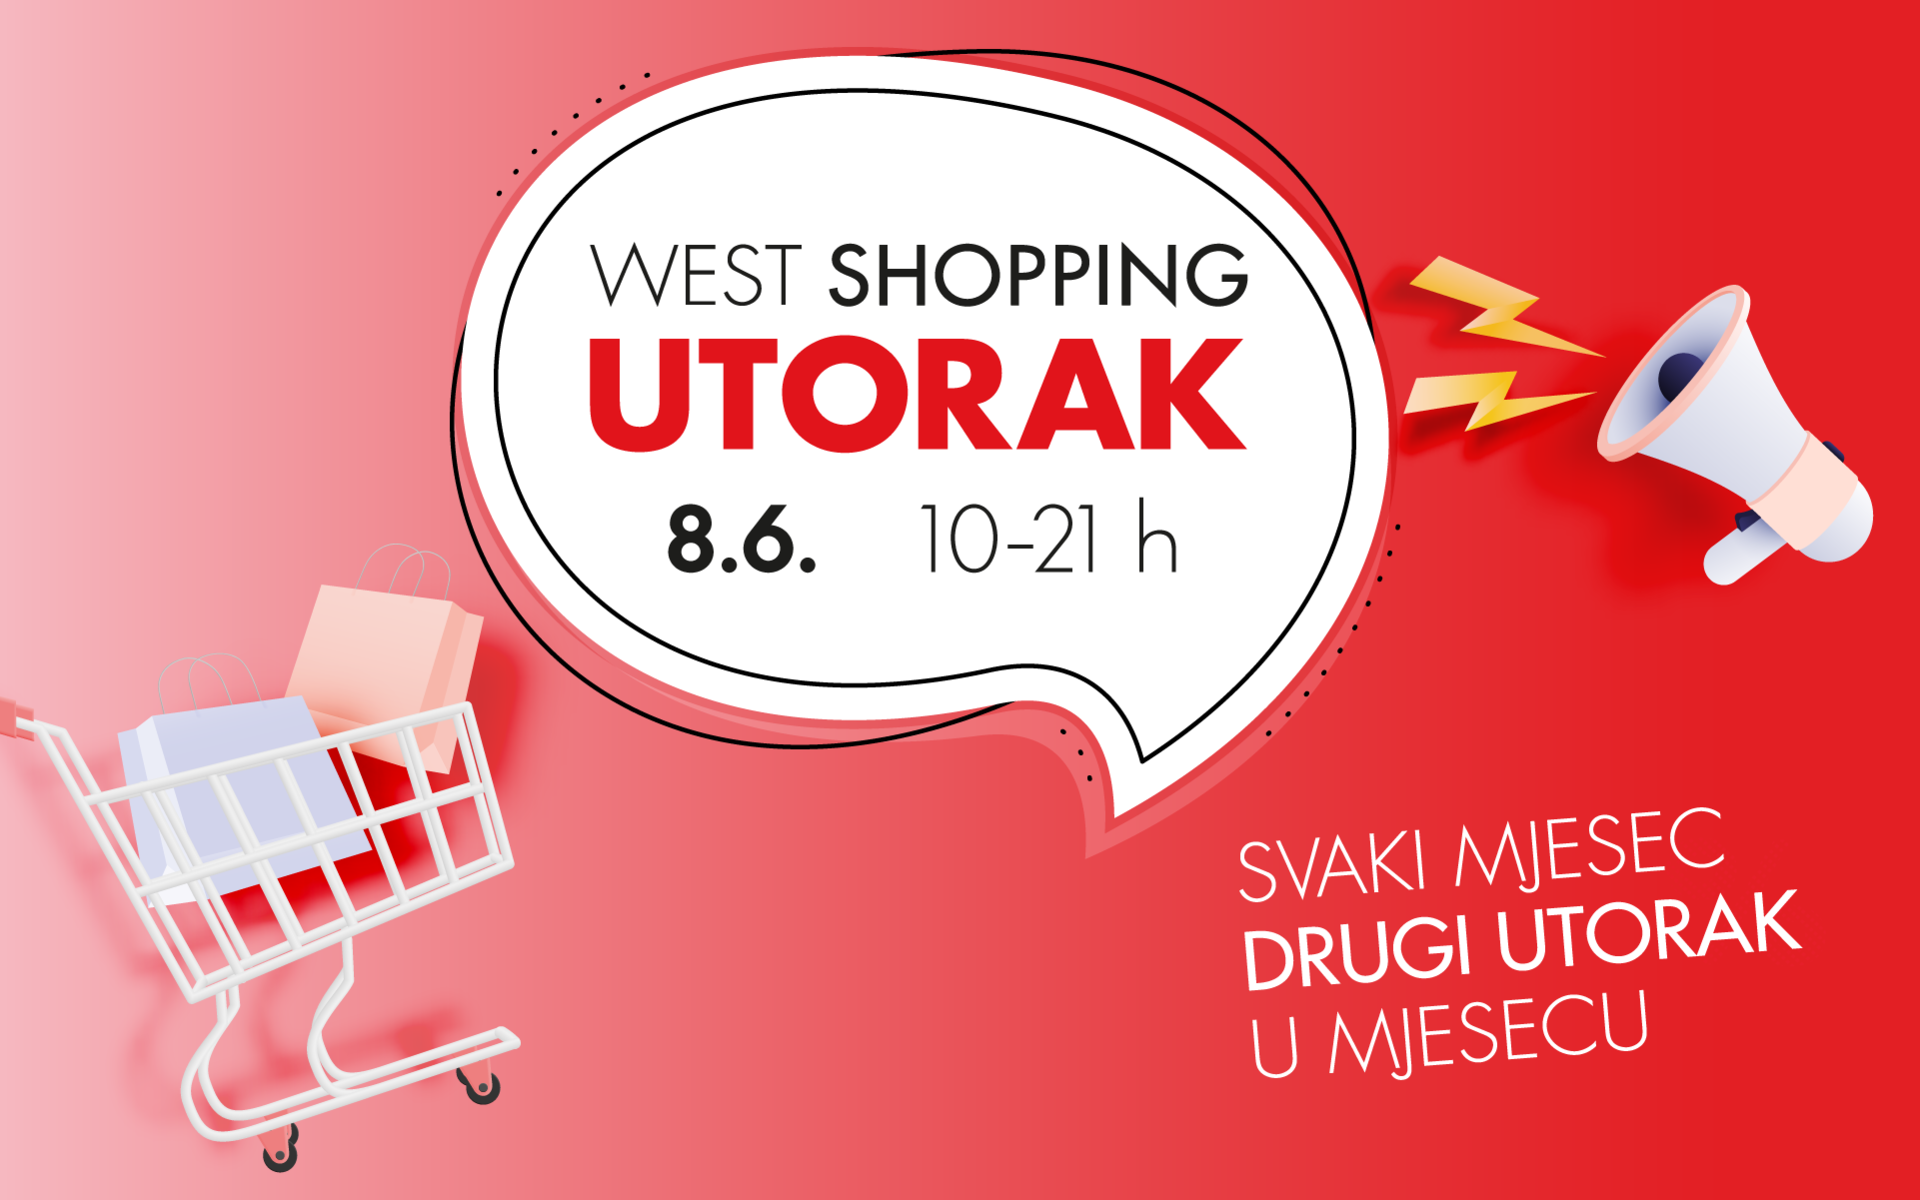 West Shopping Utorak - 8.6.2021.